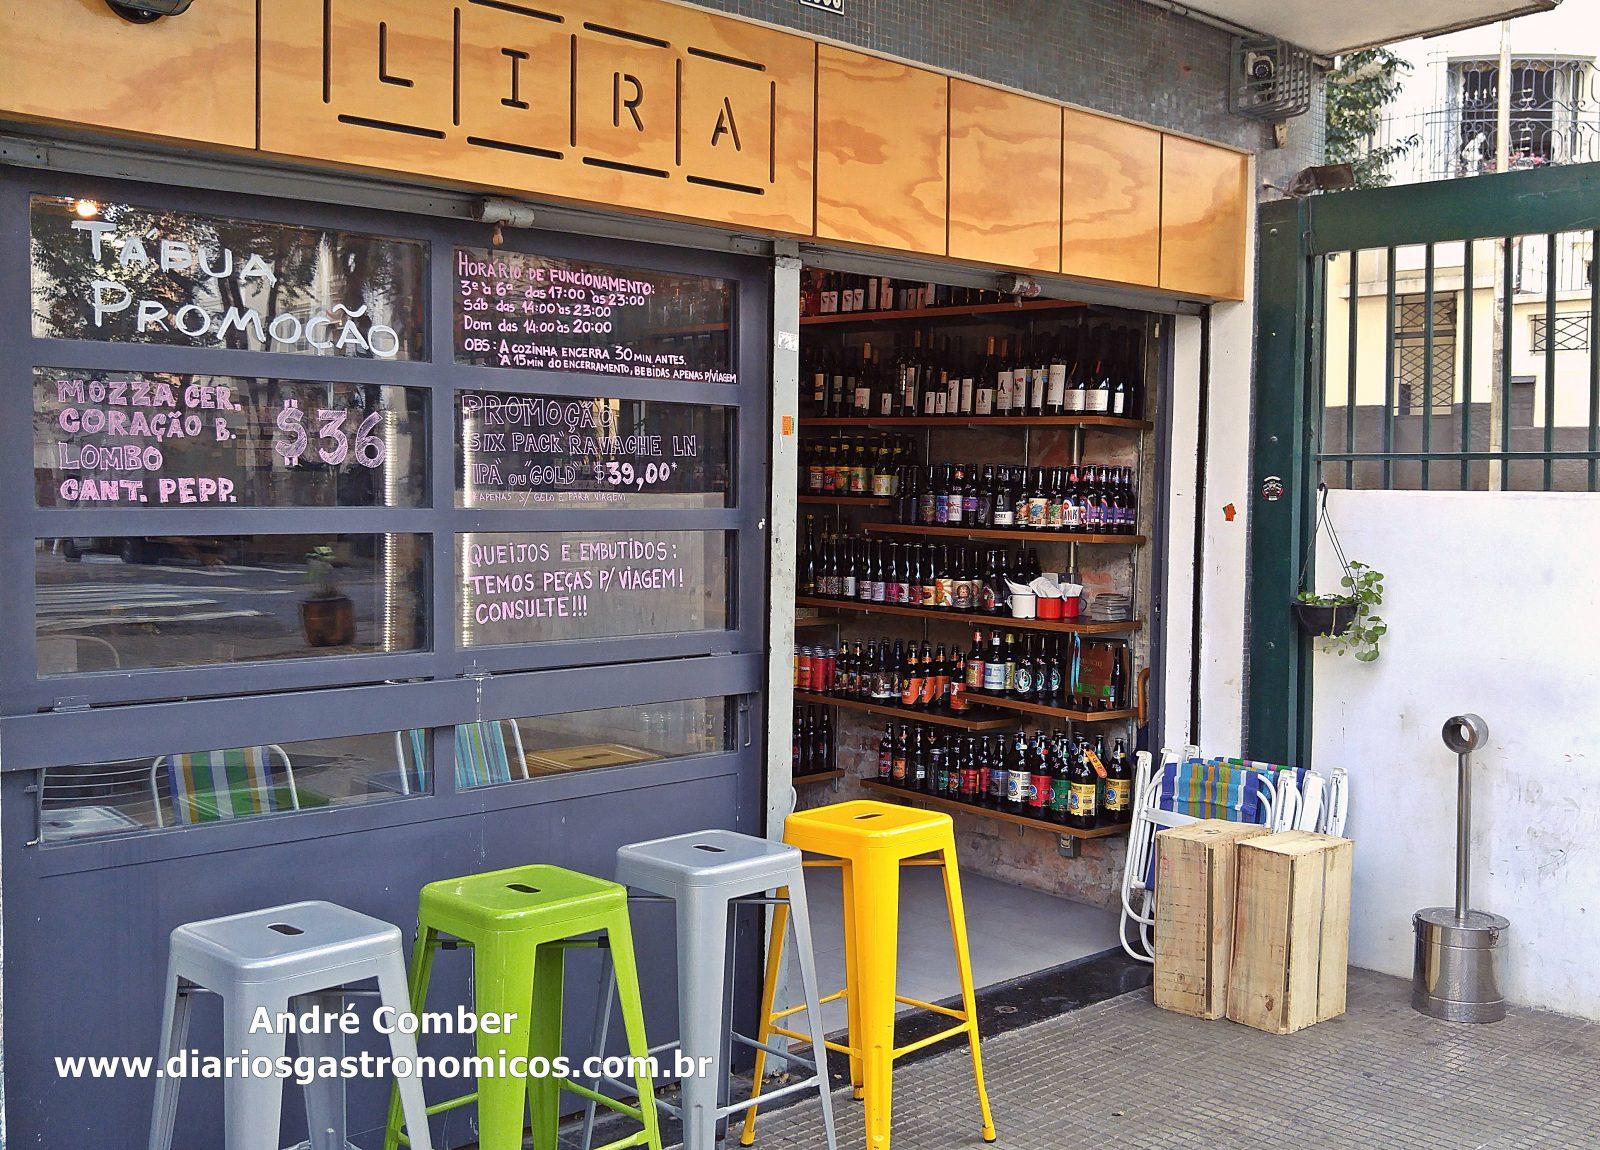 Lira Bar, Higienopolis